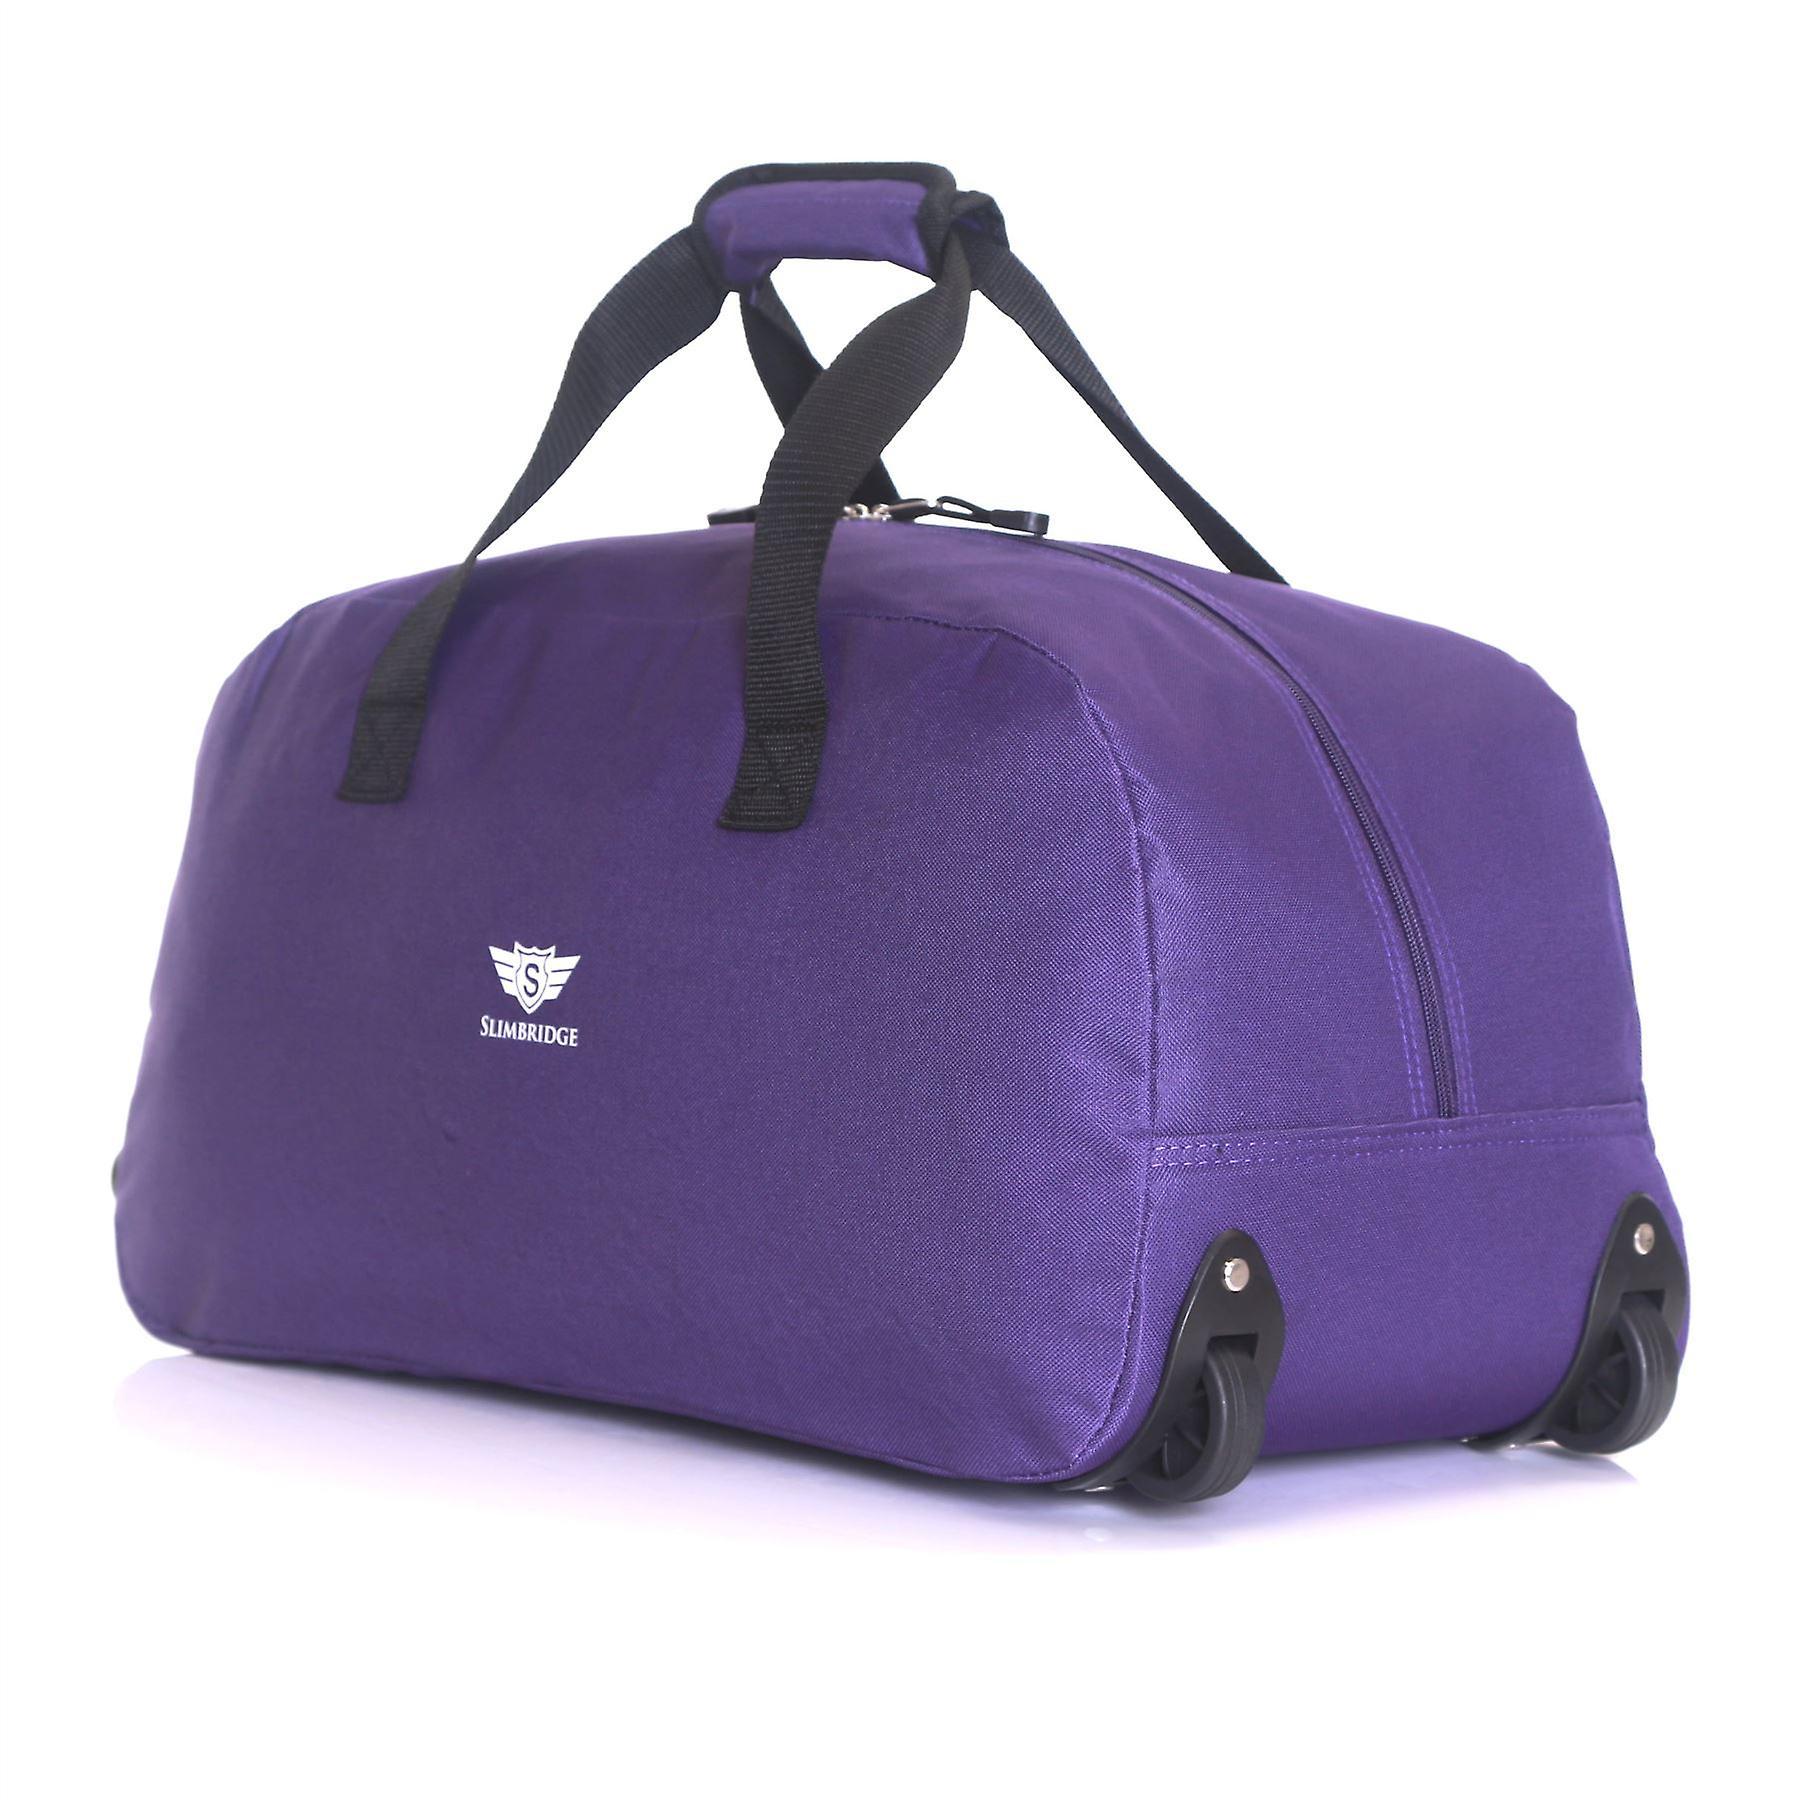 Slimbridge Castletown Cabin Approved Wheeled Bag, Purple